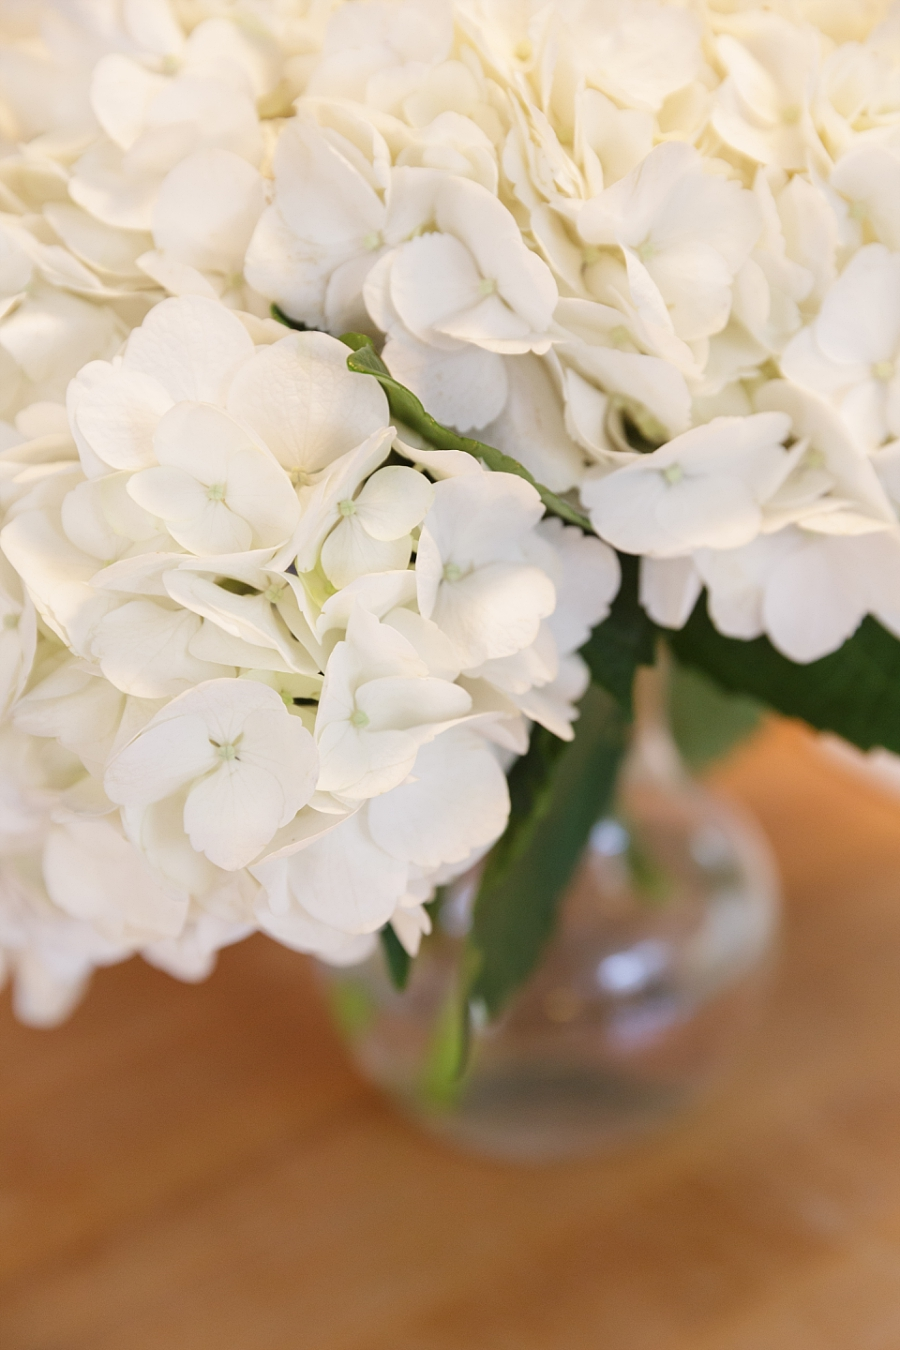 Stacy-Anderson-Photography-McGovern-Centennial-Gardens-Houston-Wedding-Photographer_0010.jpg